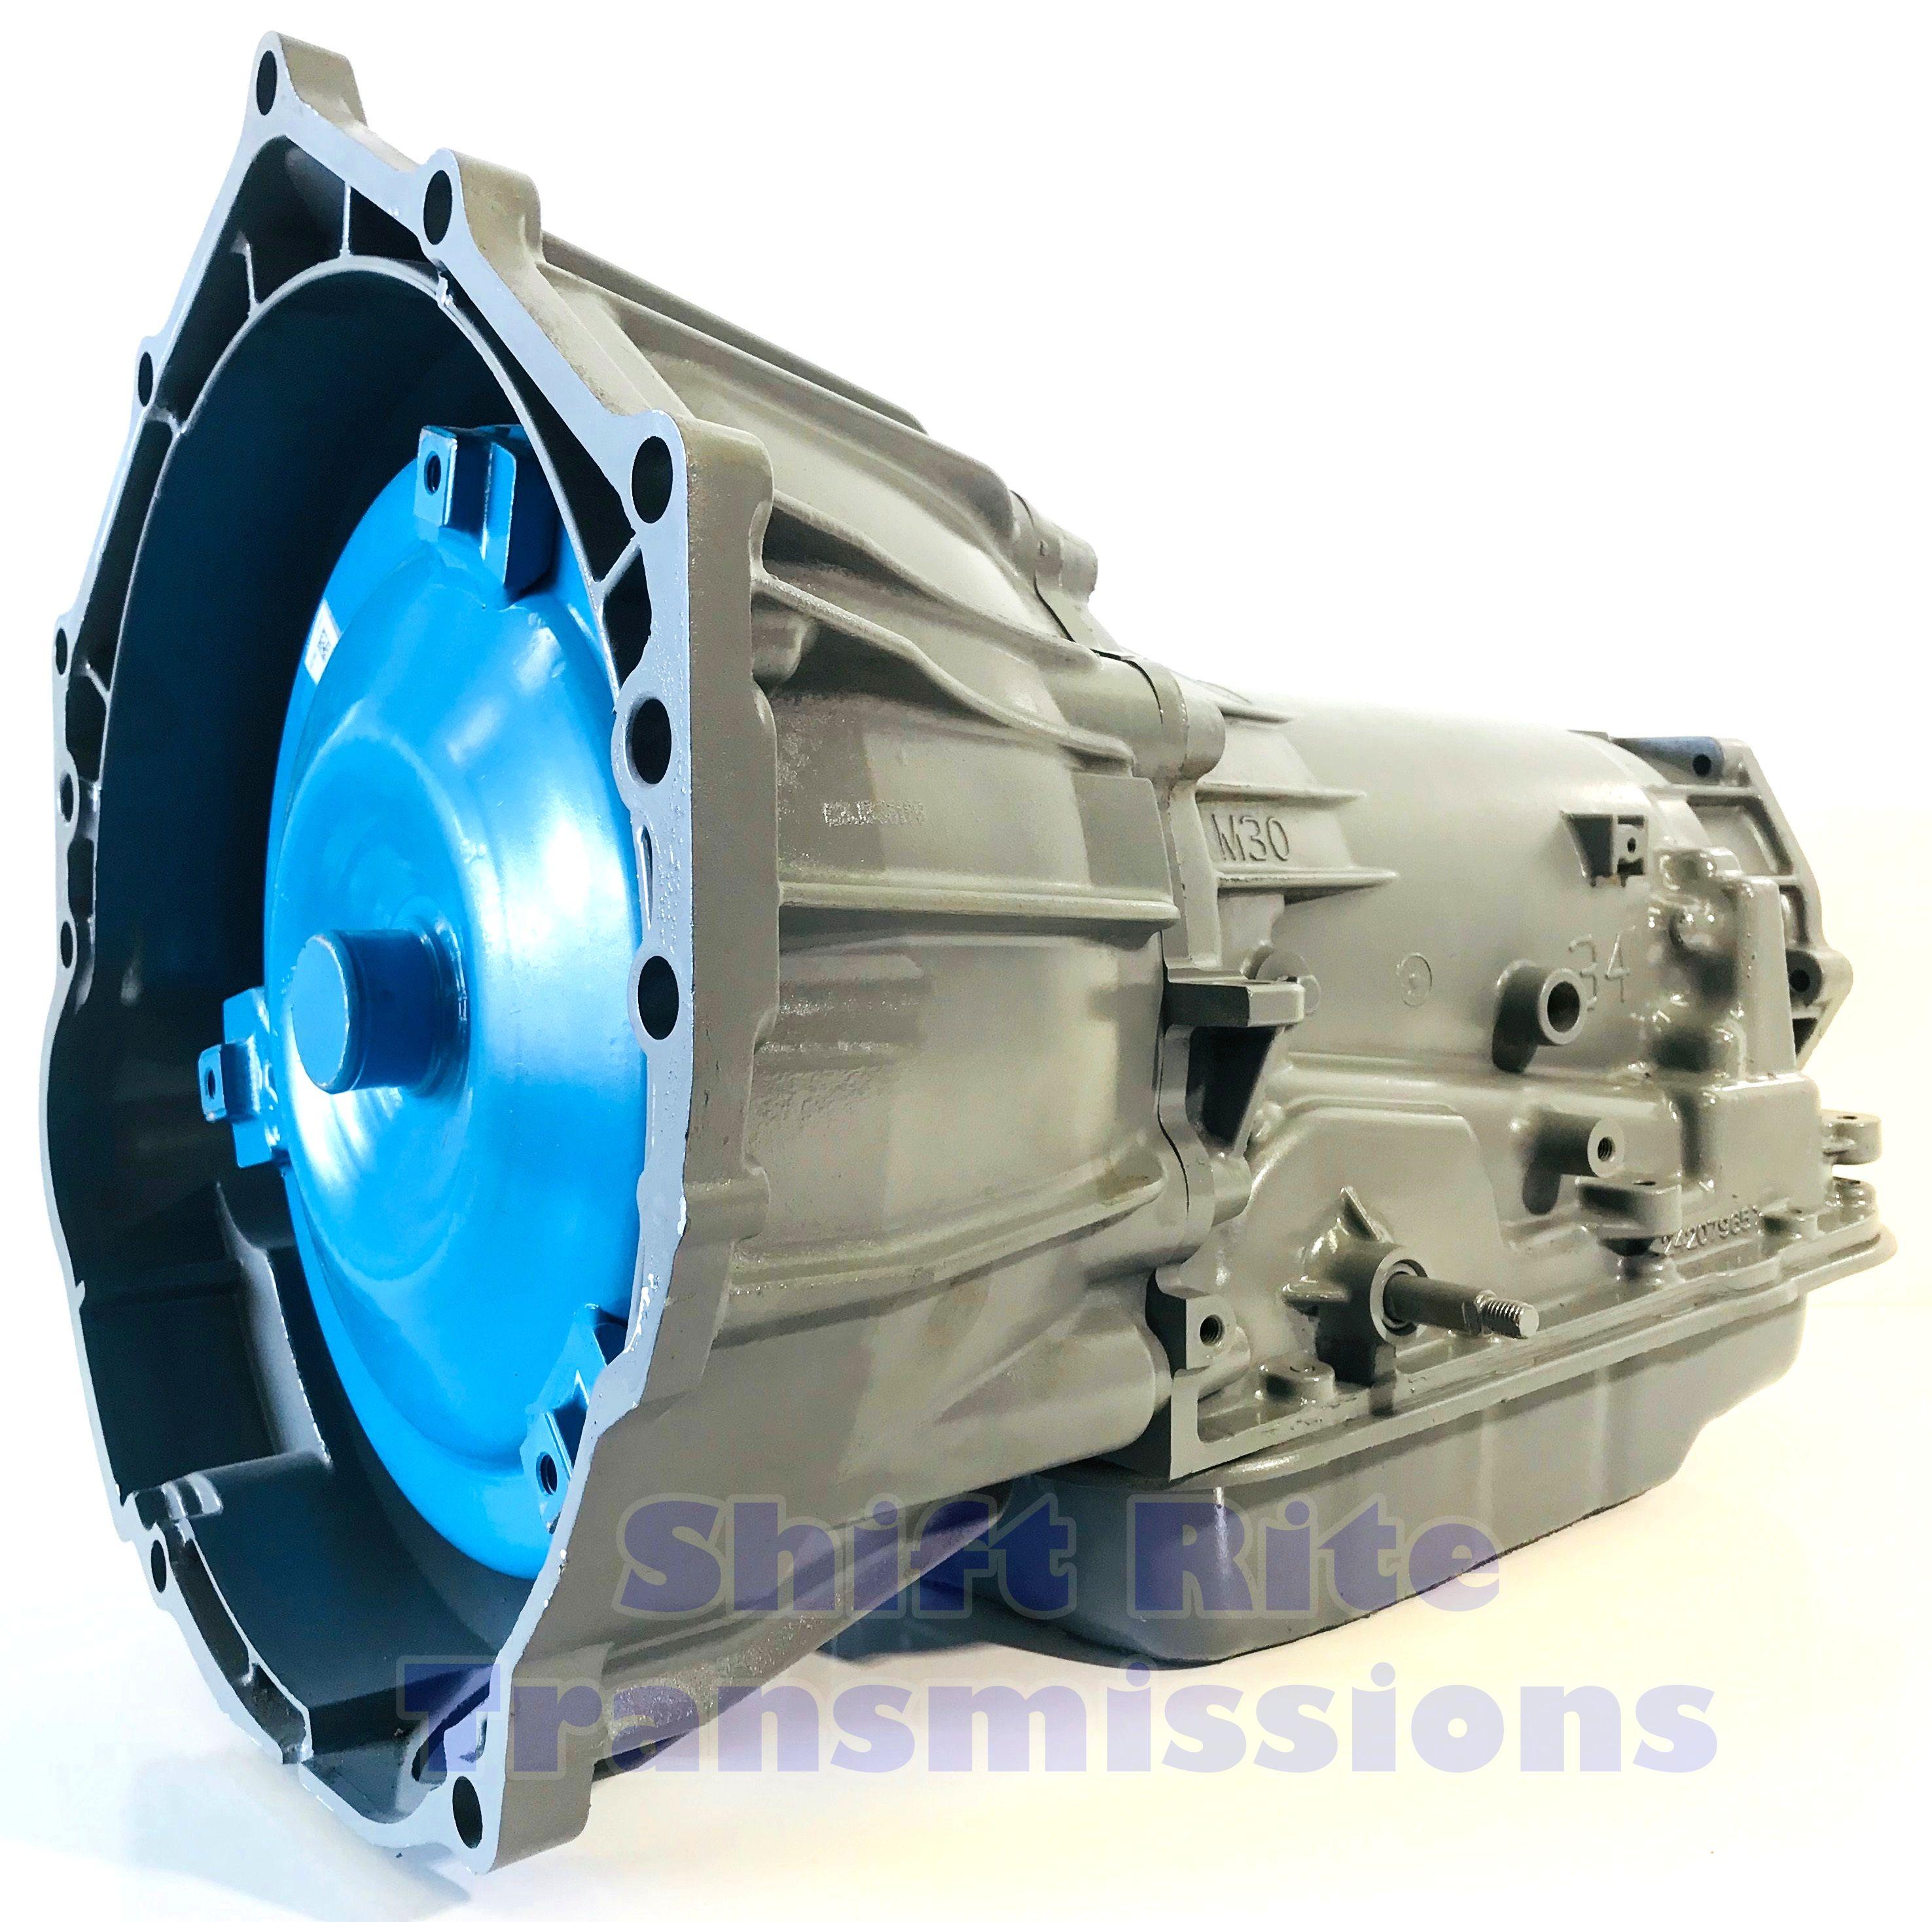 2002 Saab 43594 Transmission: 4L65E 2001-2006 AWD TRANSMISSION 6.0L